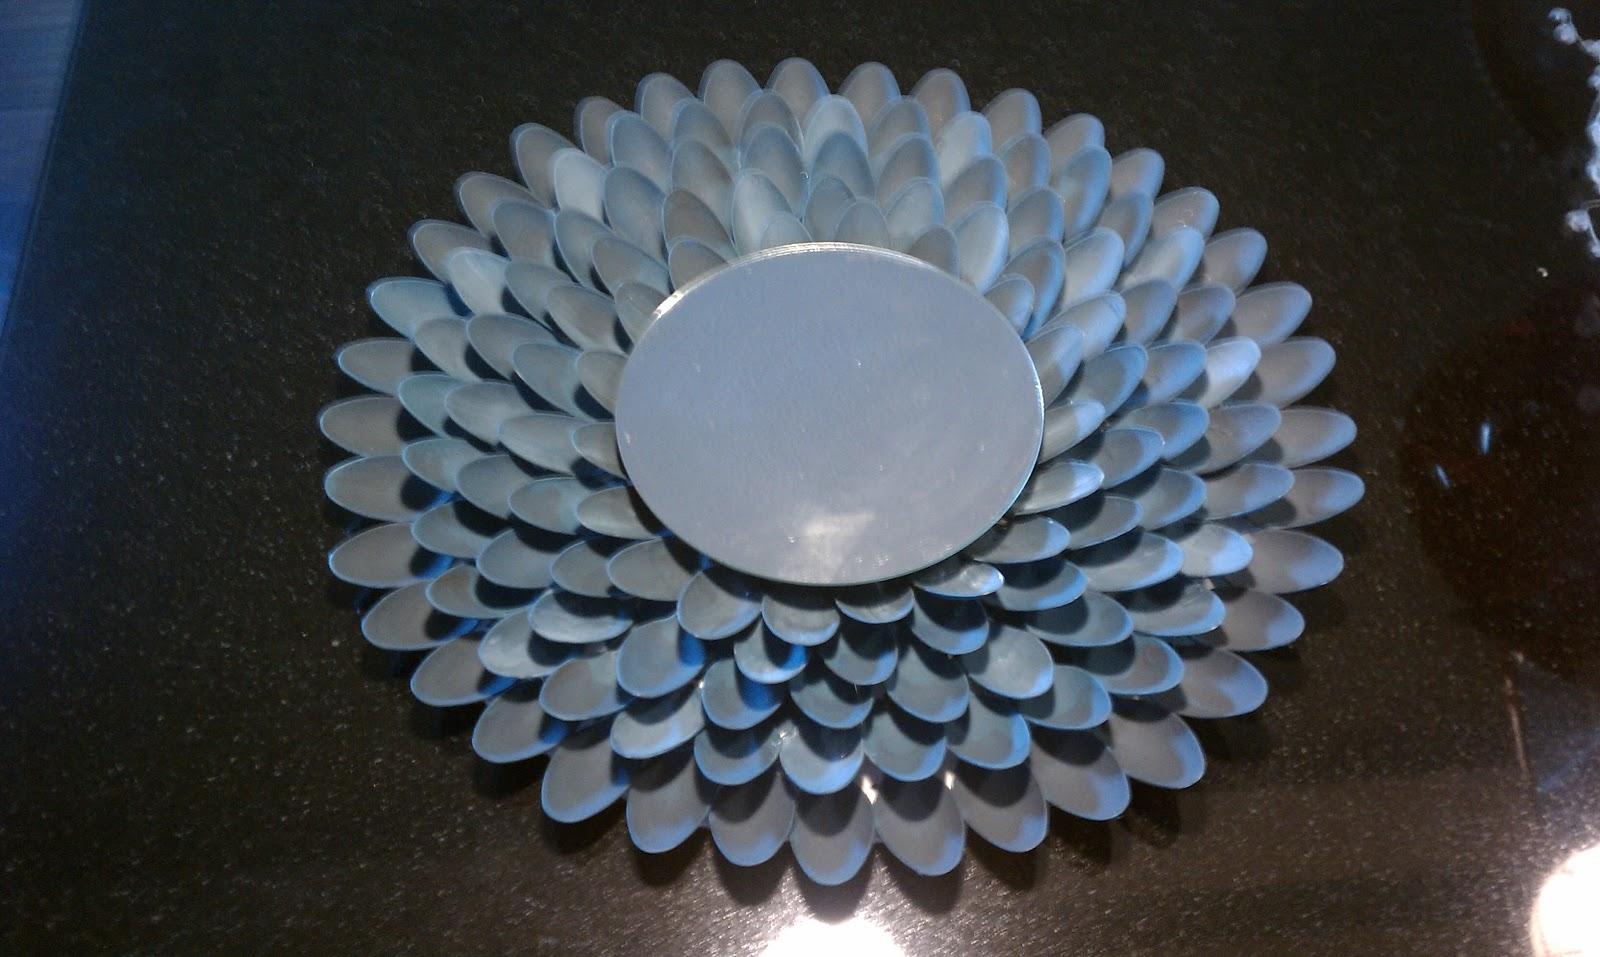 Nadia39s DIY Projects DIY Plastic Spoon Mirror